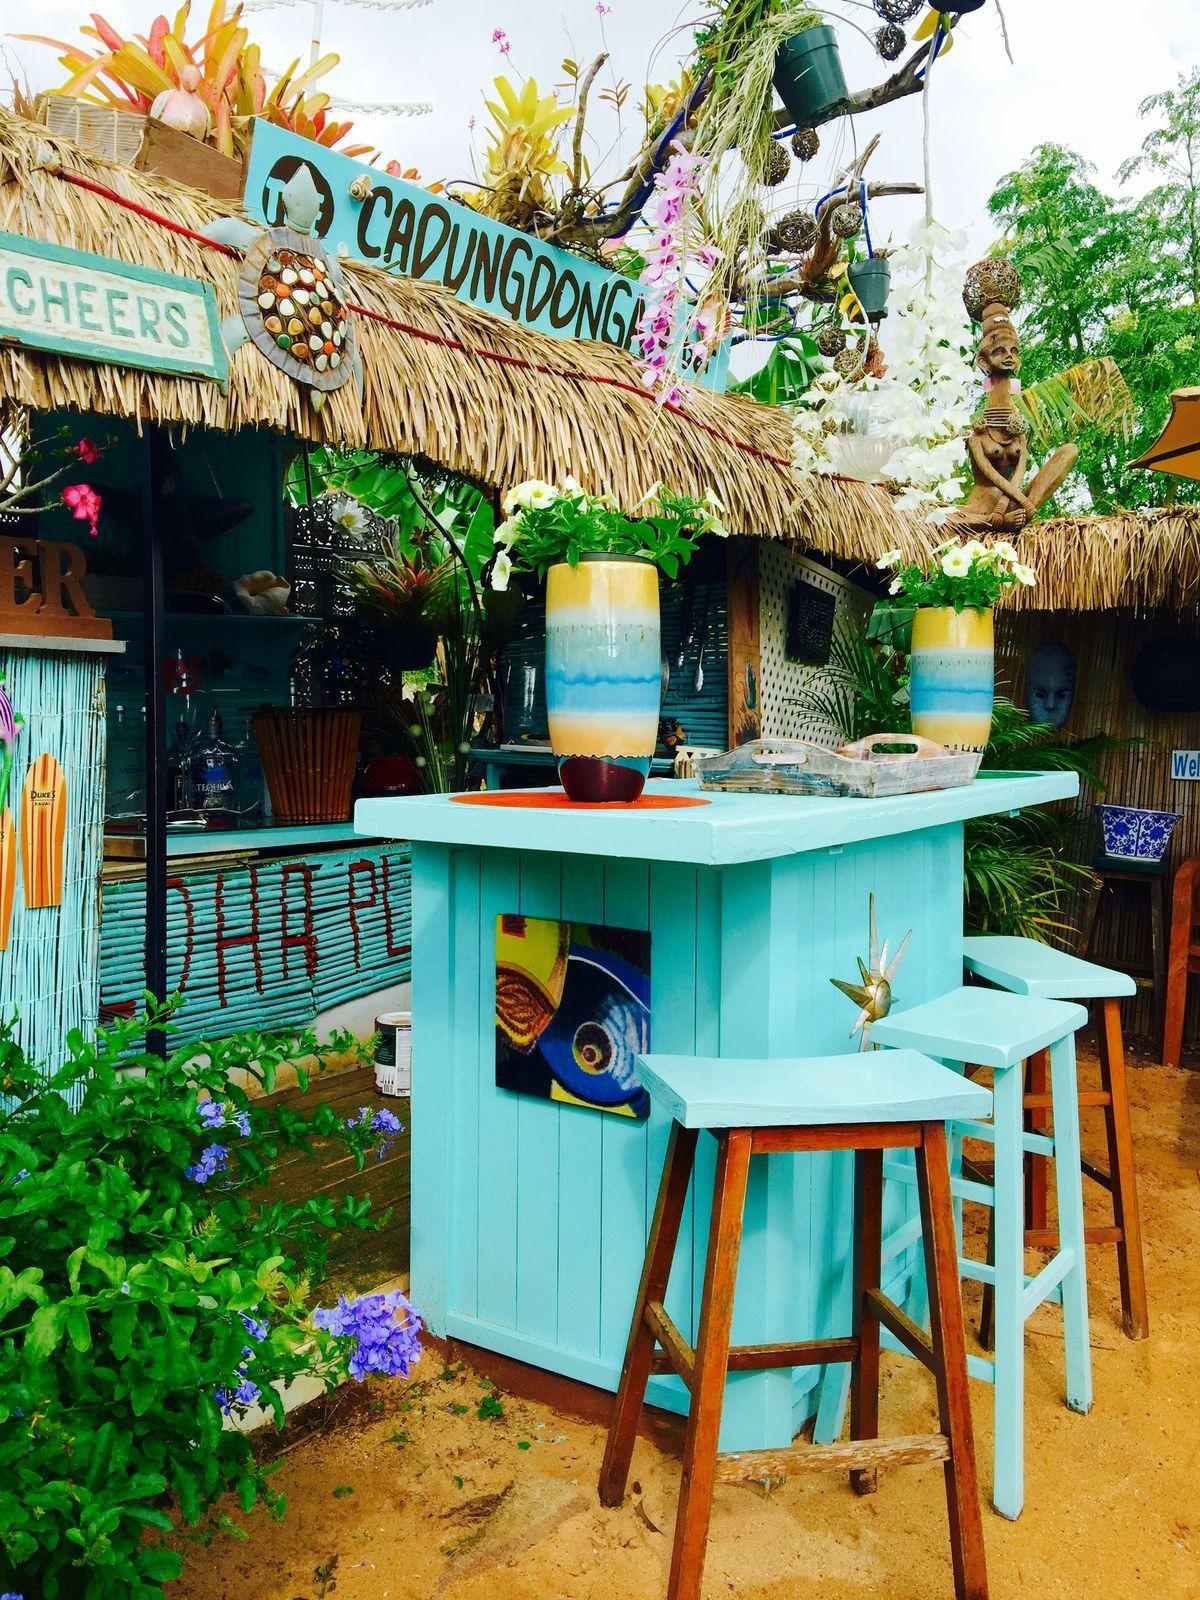 Ta Wraiotera Beach Bar Bar Restaurant Me Khpo Decor Interiors More Bar Veranda Garden Plants Blue Br Tiki Bar Decor Outdoor Tiki Bar Backyard Bar